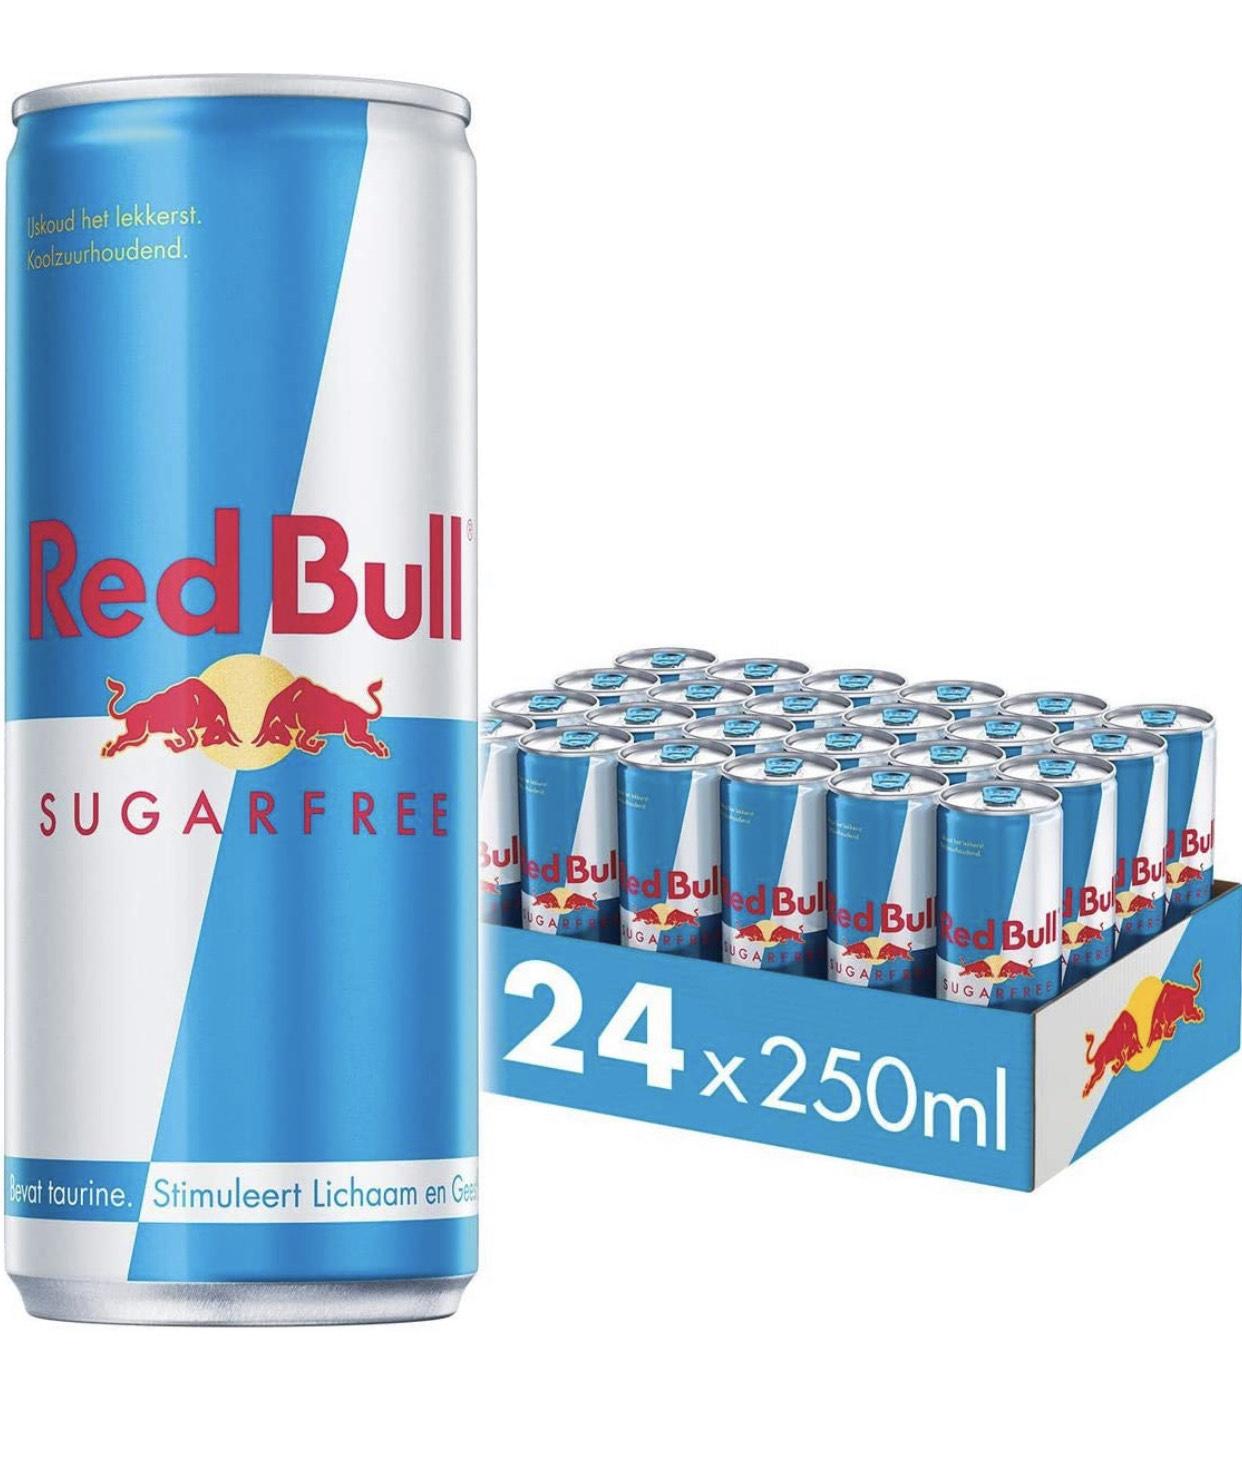 Red Bull Sugarfree (24 can)